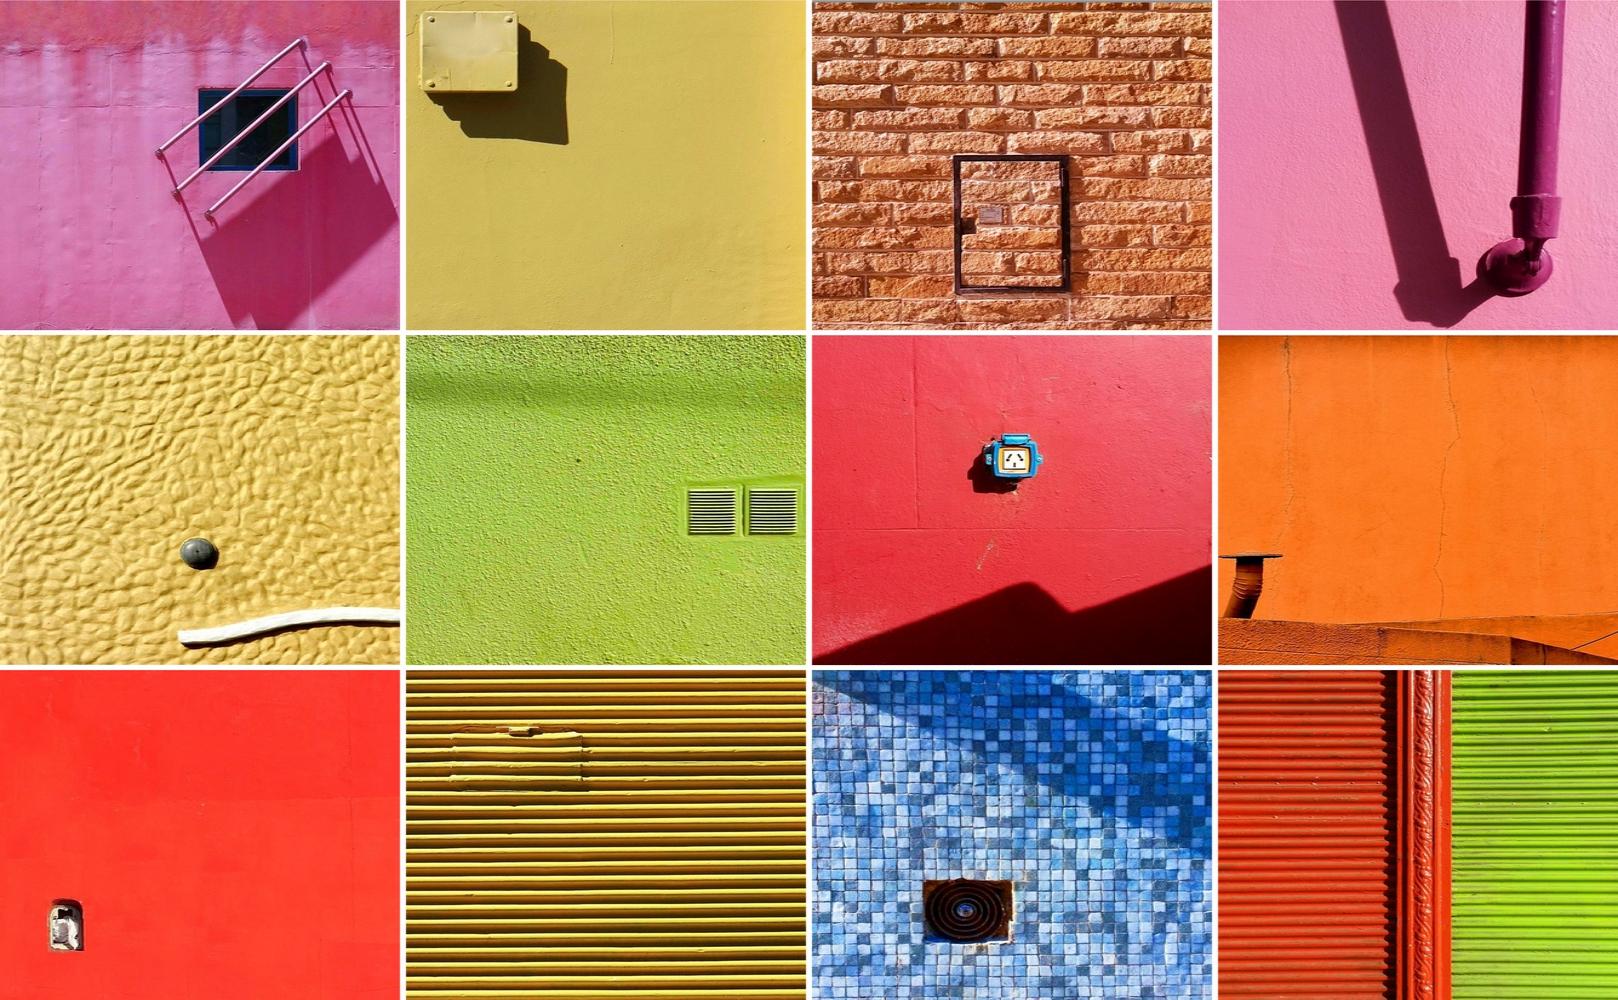 Portada_Fotografìa_Minimalista_Hernanmat